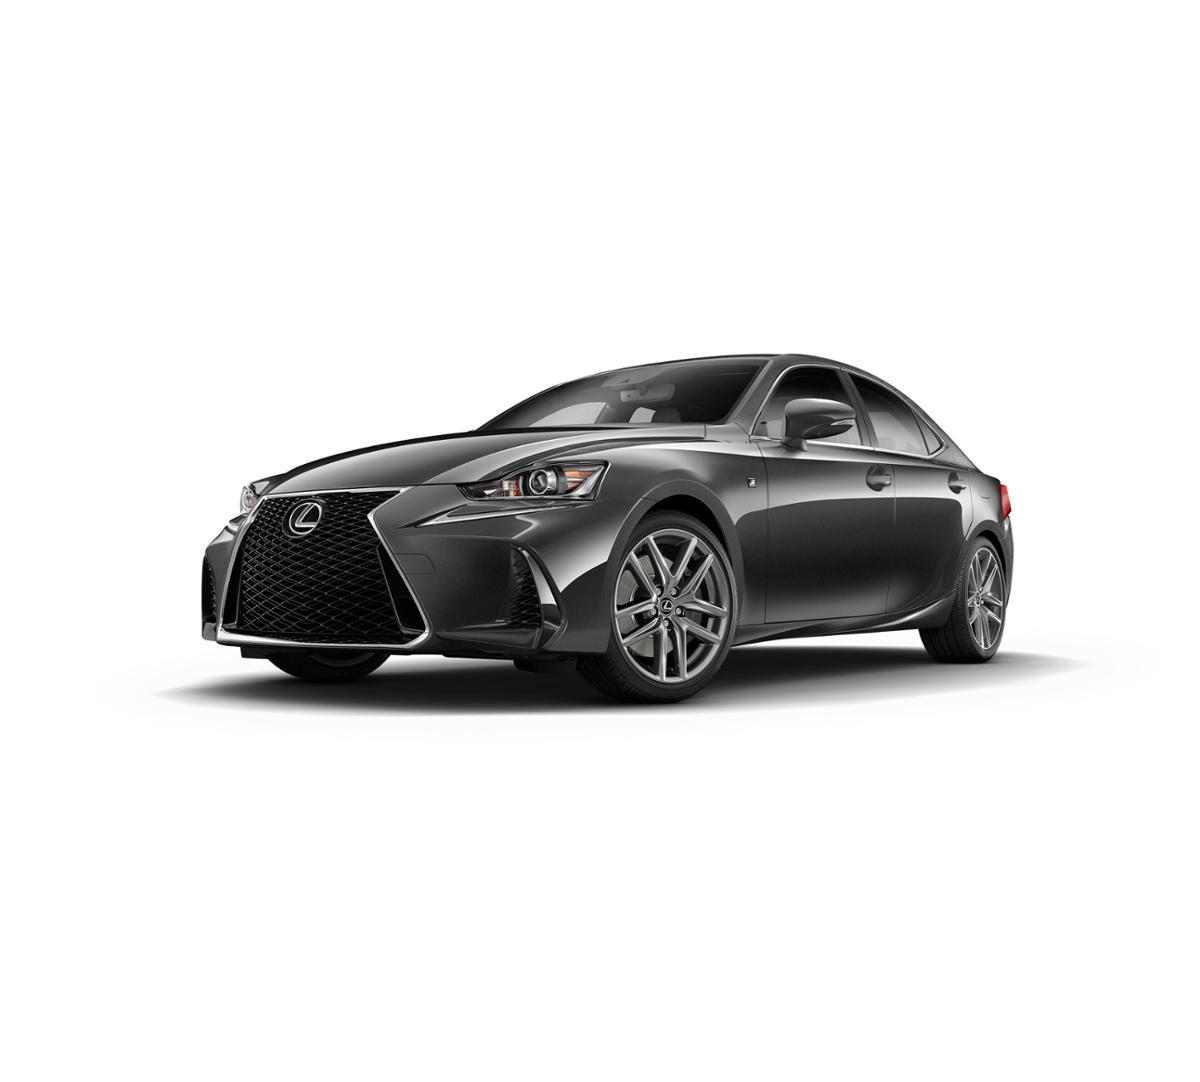 2018 Lexus IS Vehicle Photo in Henderson, NV 89011